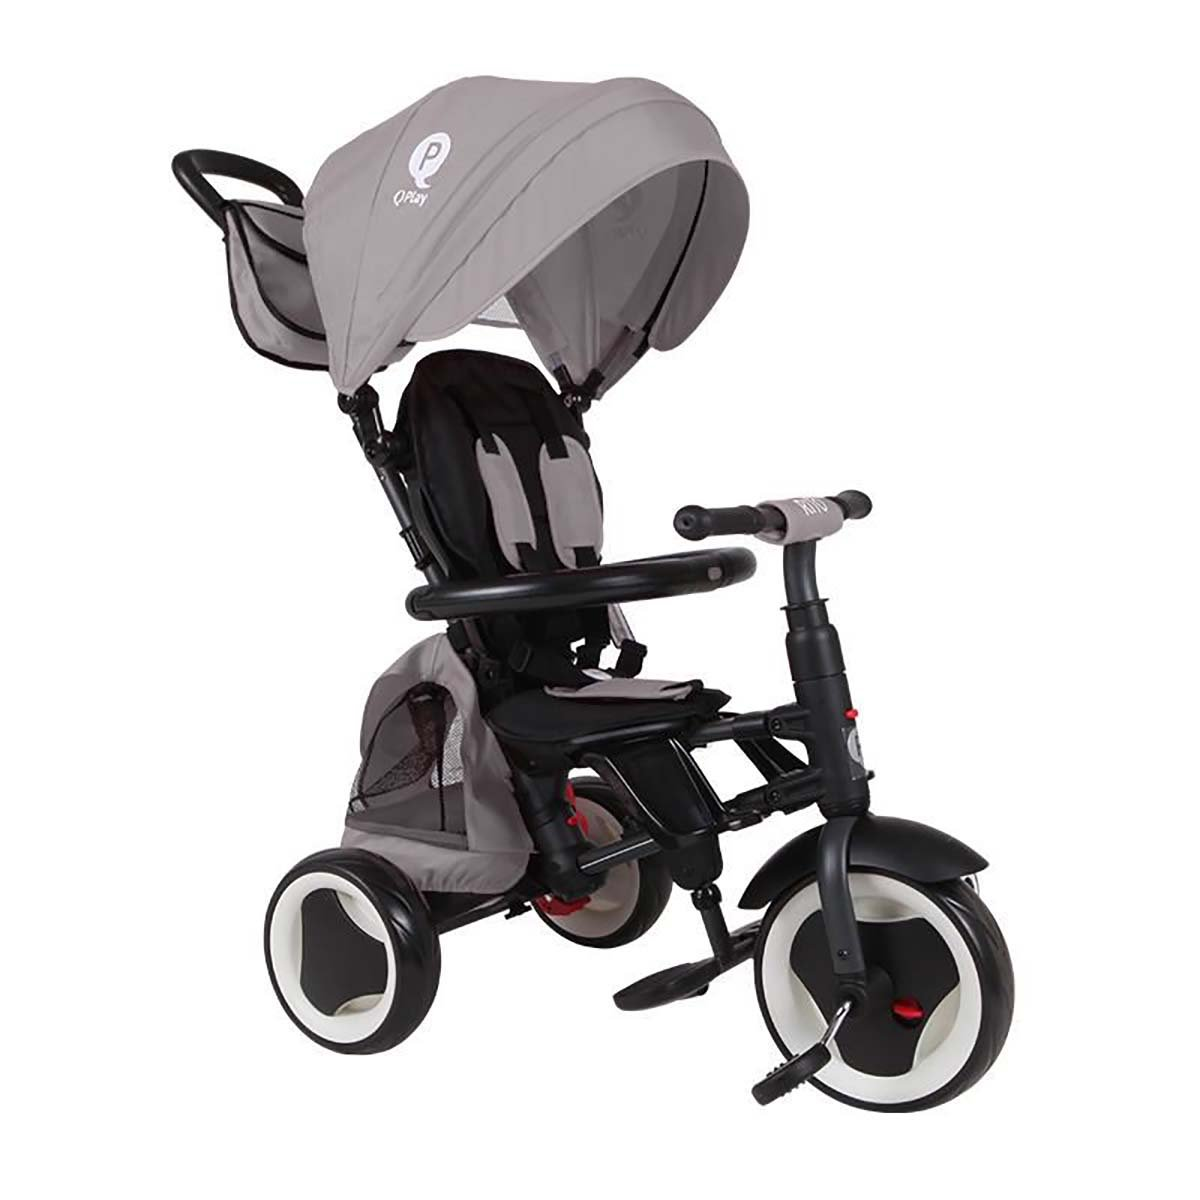 Tricicleta pliabila Qplay Rito Plus, Gri